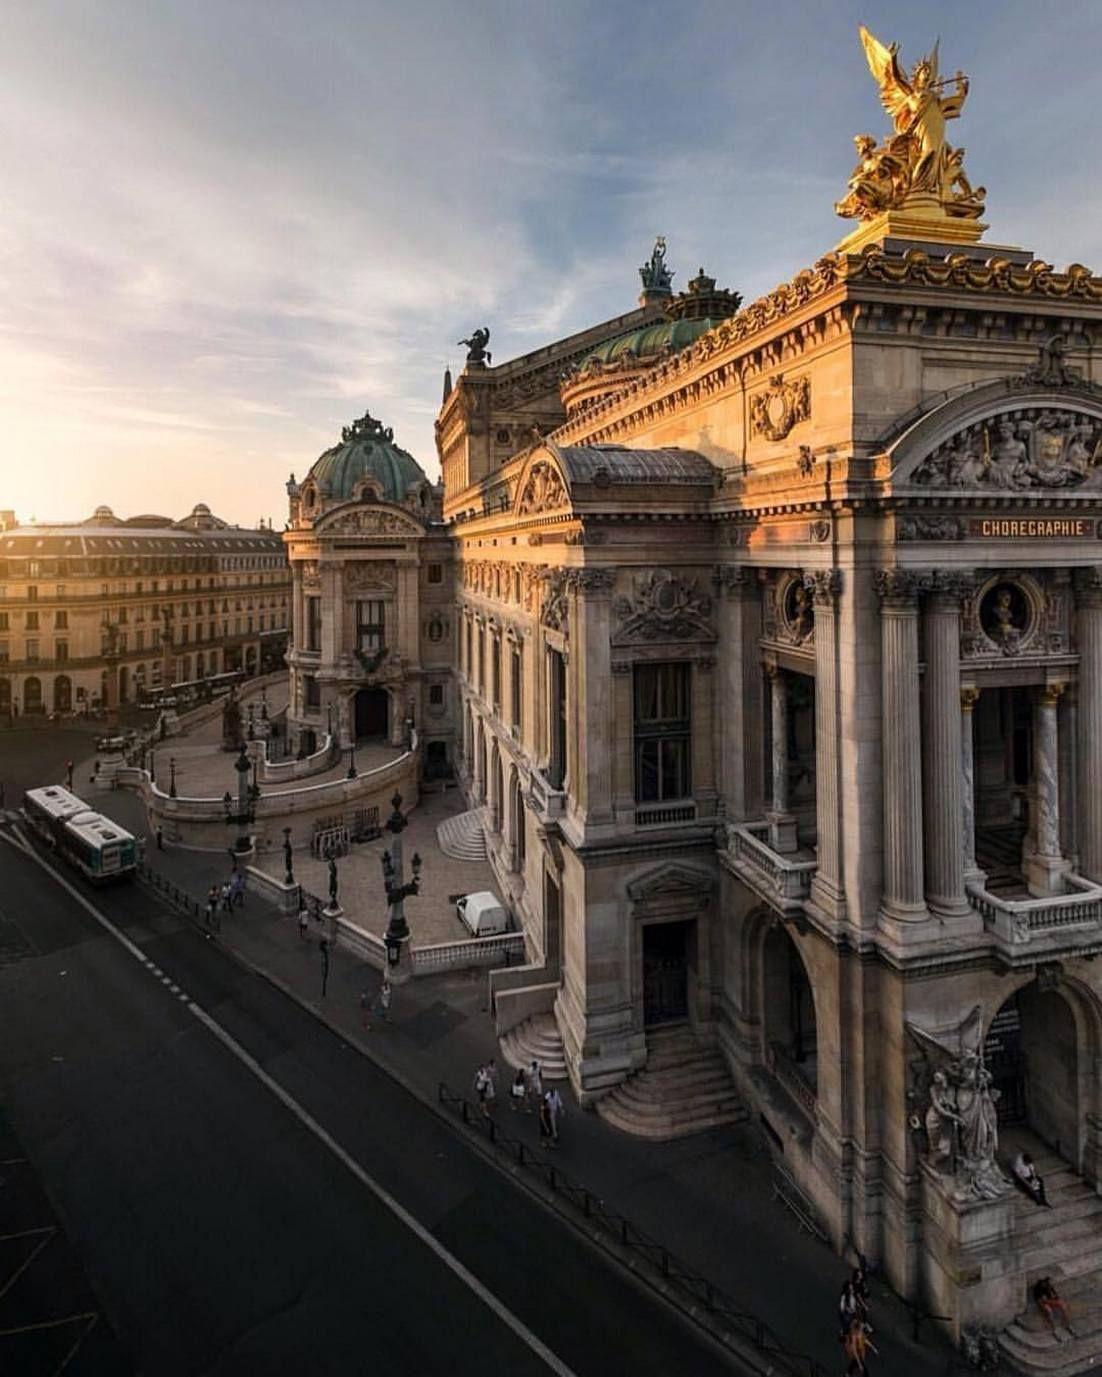 90+ Gorgeous Paris Instagram Pictures, Make Your Happy Holiday #landscapepics